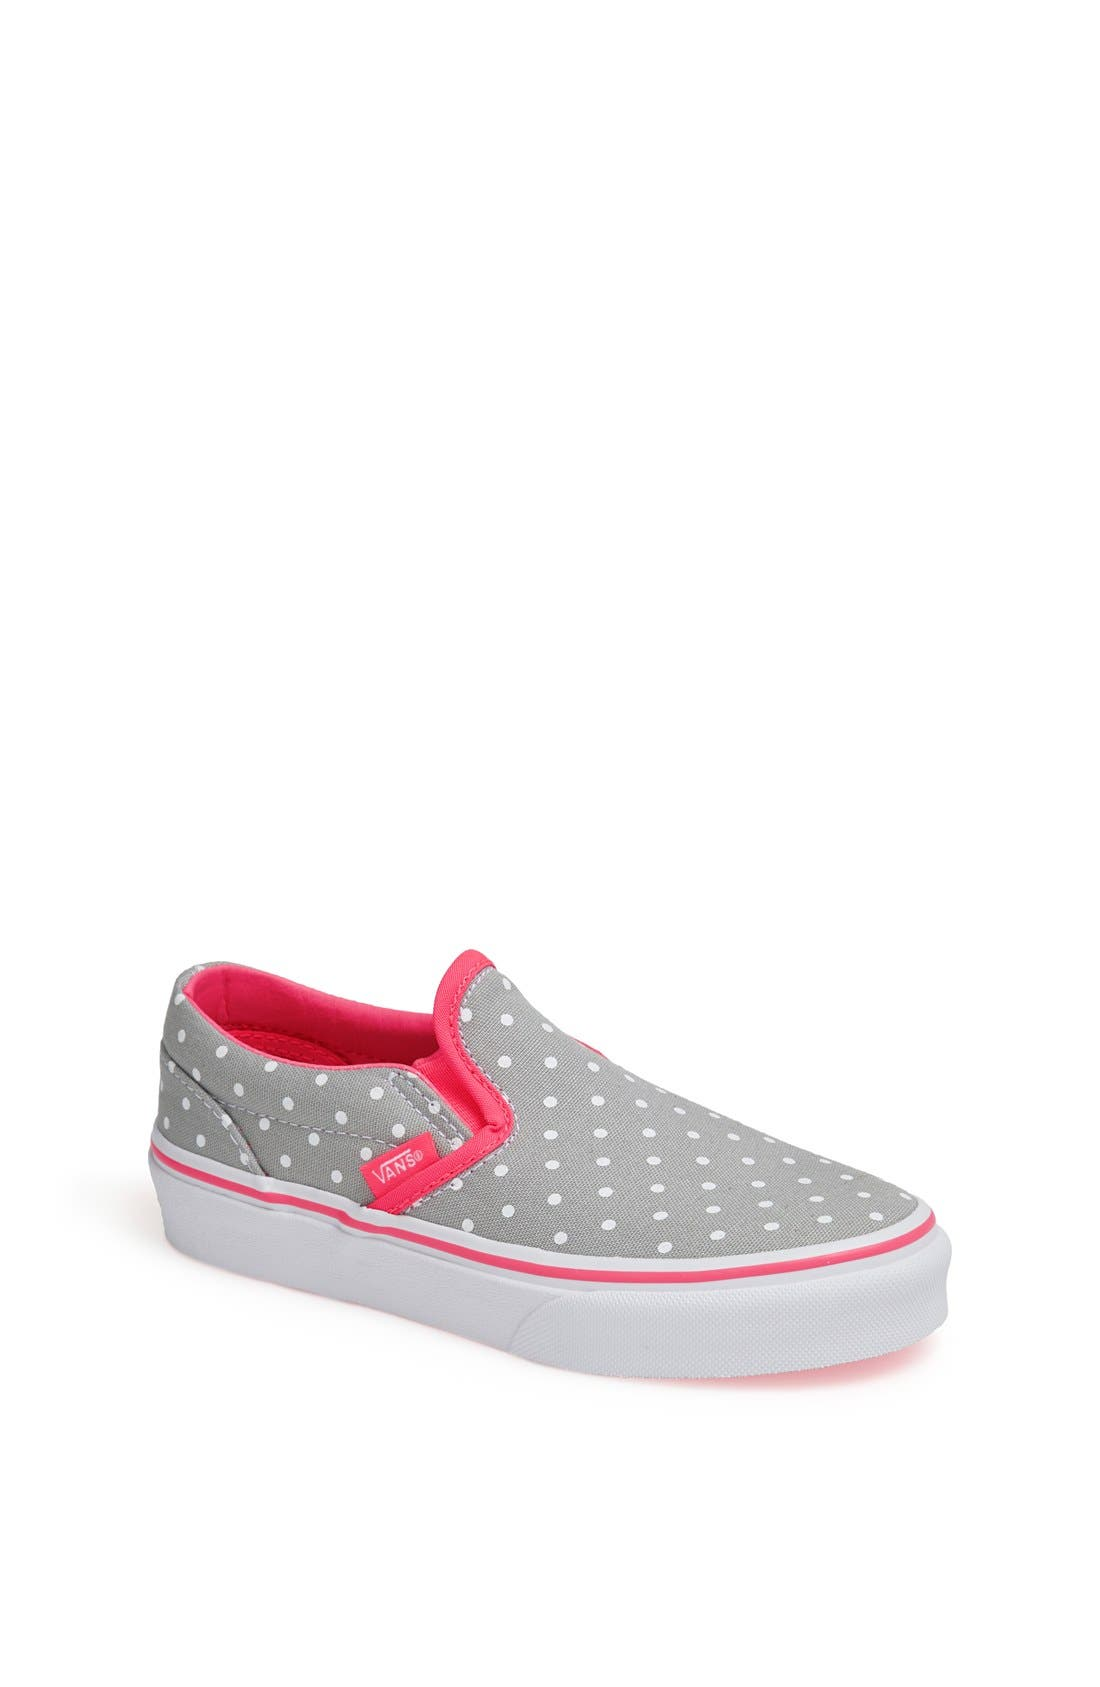 Main Image - Vans Slip-On Sneaker (Toddler, Little Kid & Big Kid)